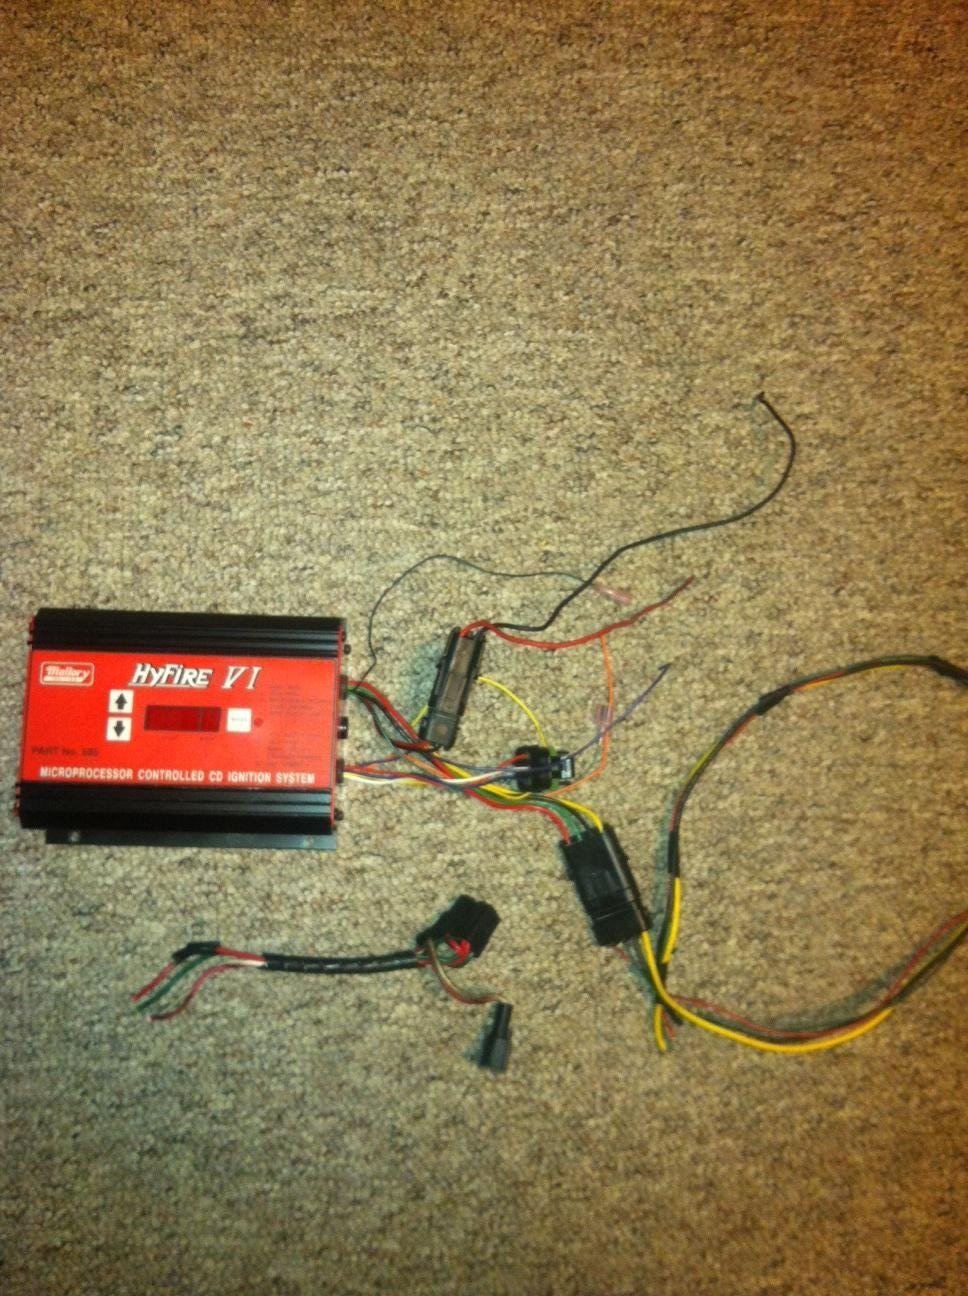 hight resolution of mallory hyfire vi 685 cd ignition box